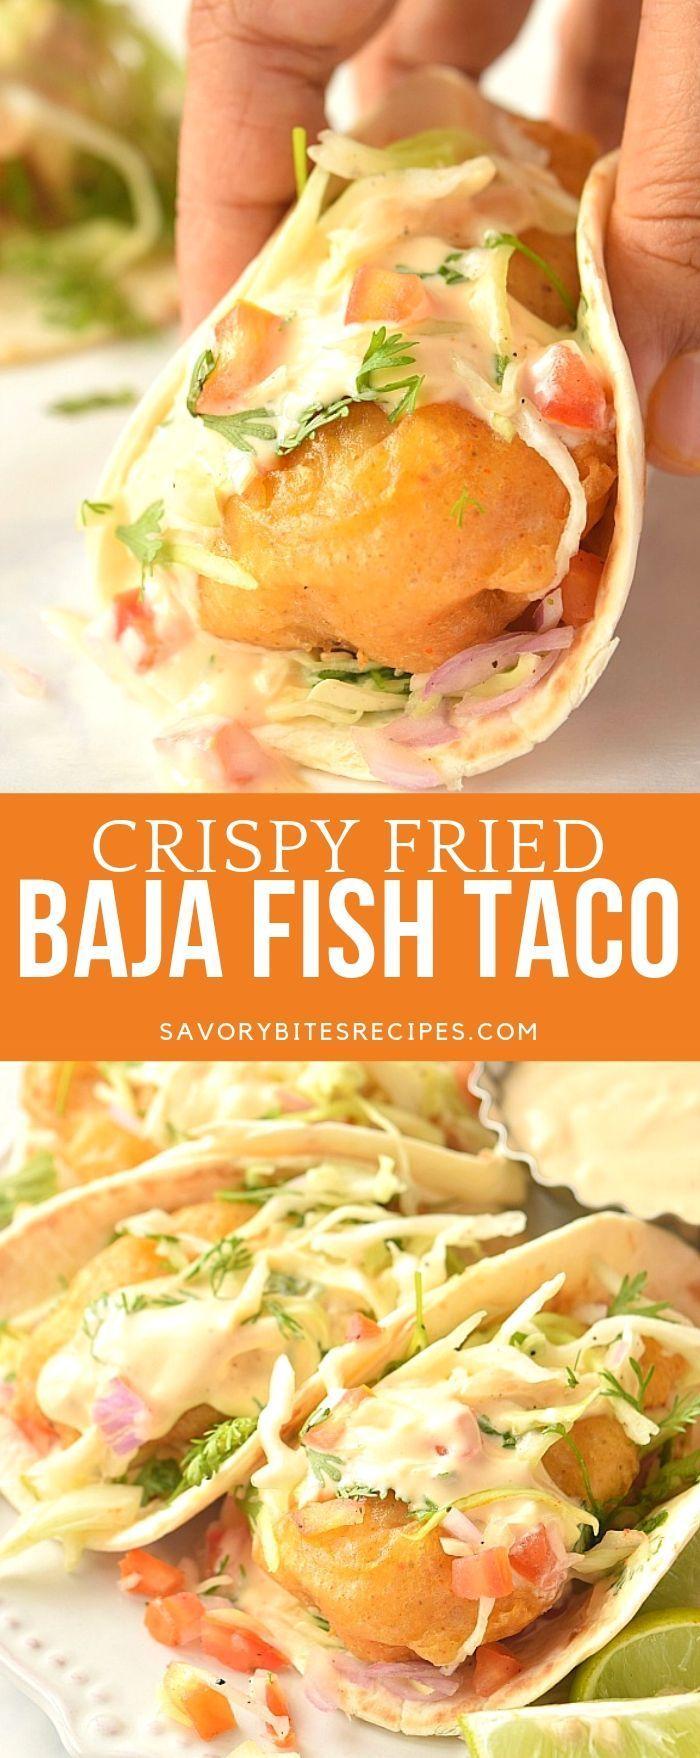 Photo of The Ultimate Crispy Baja Taco (Best Baja Fish Taco Recipe)